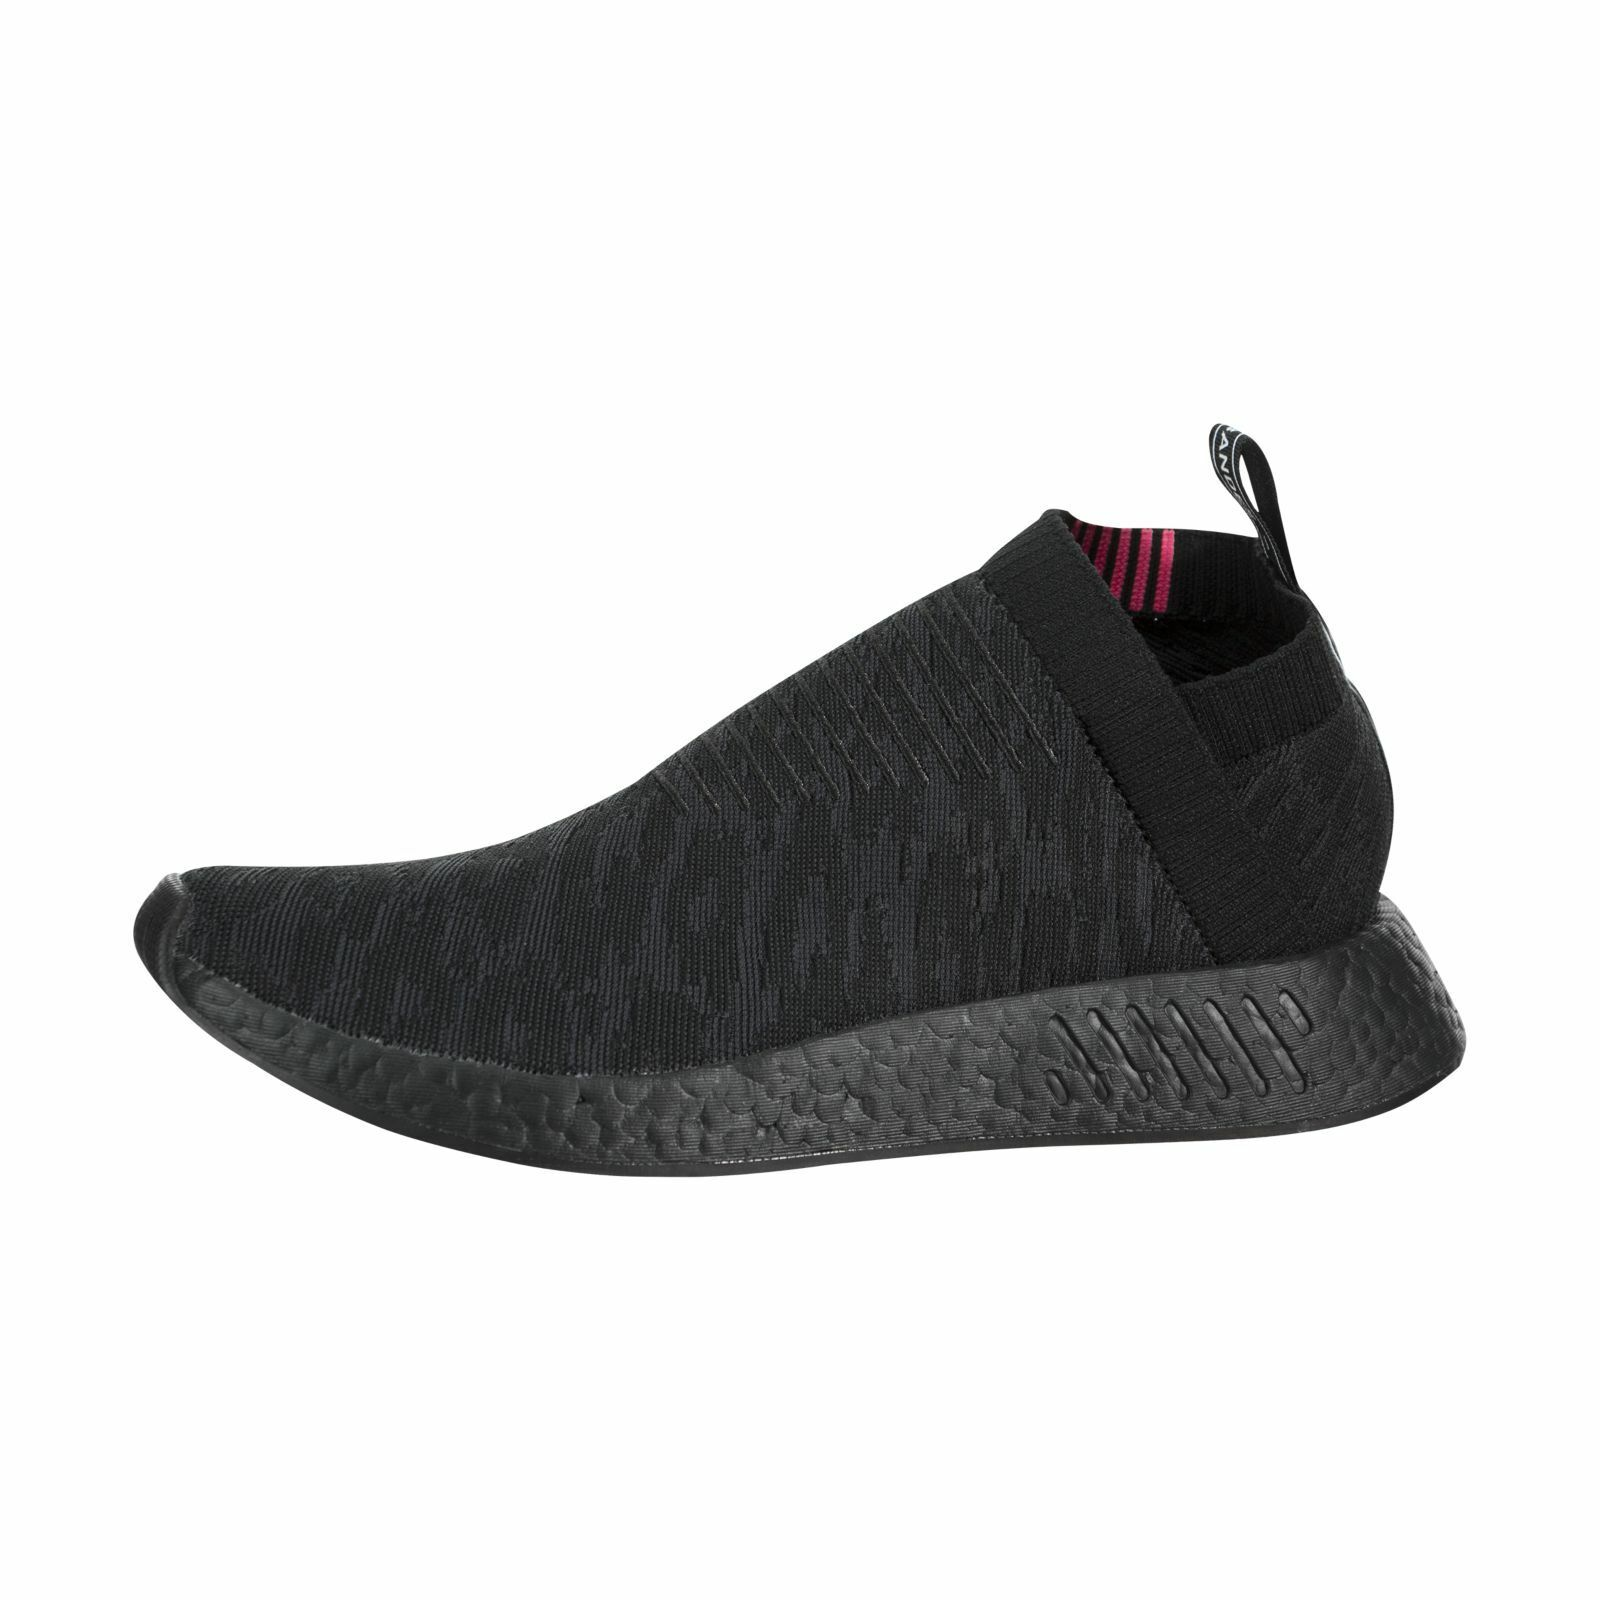 02046441a7acf adidas NMD Cs2 PK Triple Black Sz 8 Cq2373 City Sock Primeknit Shock ...